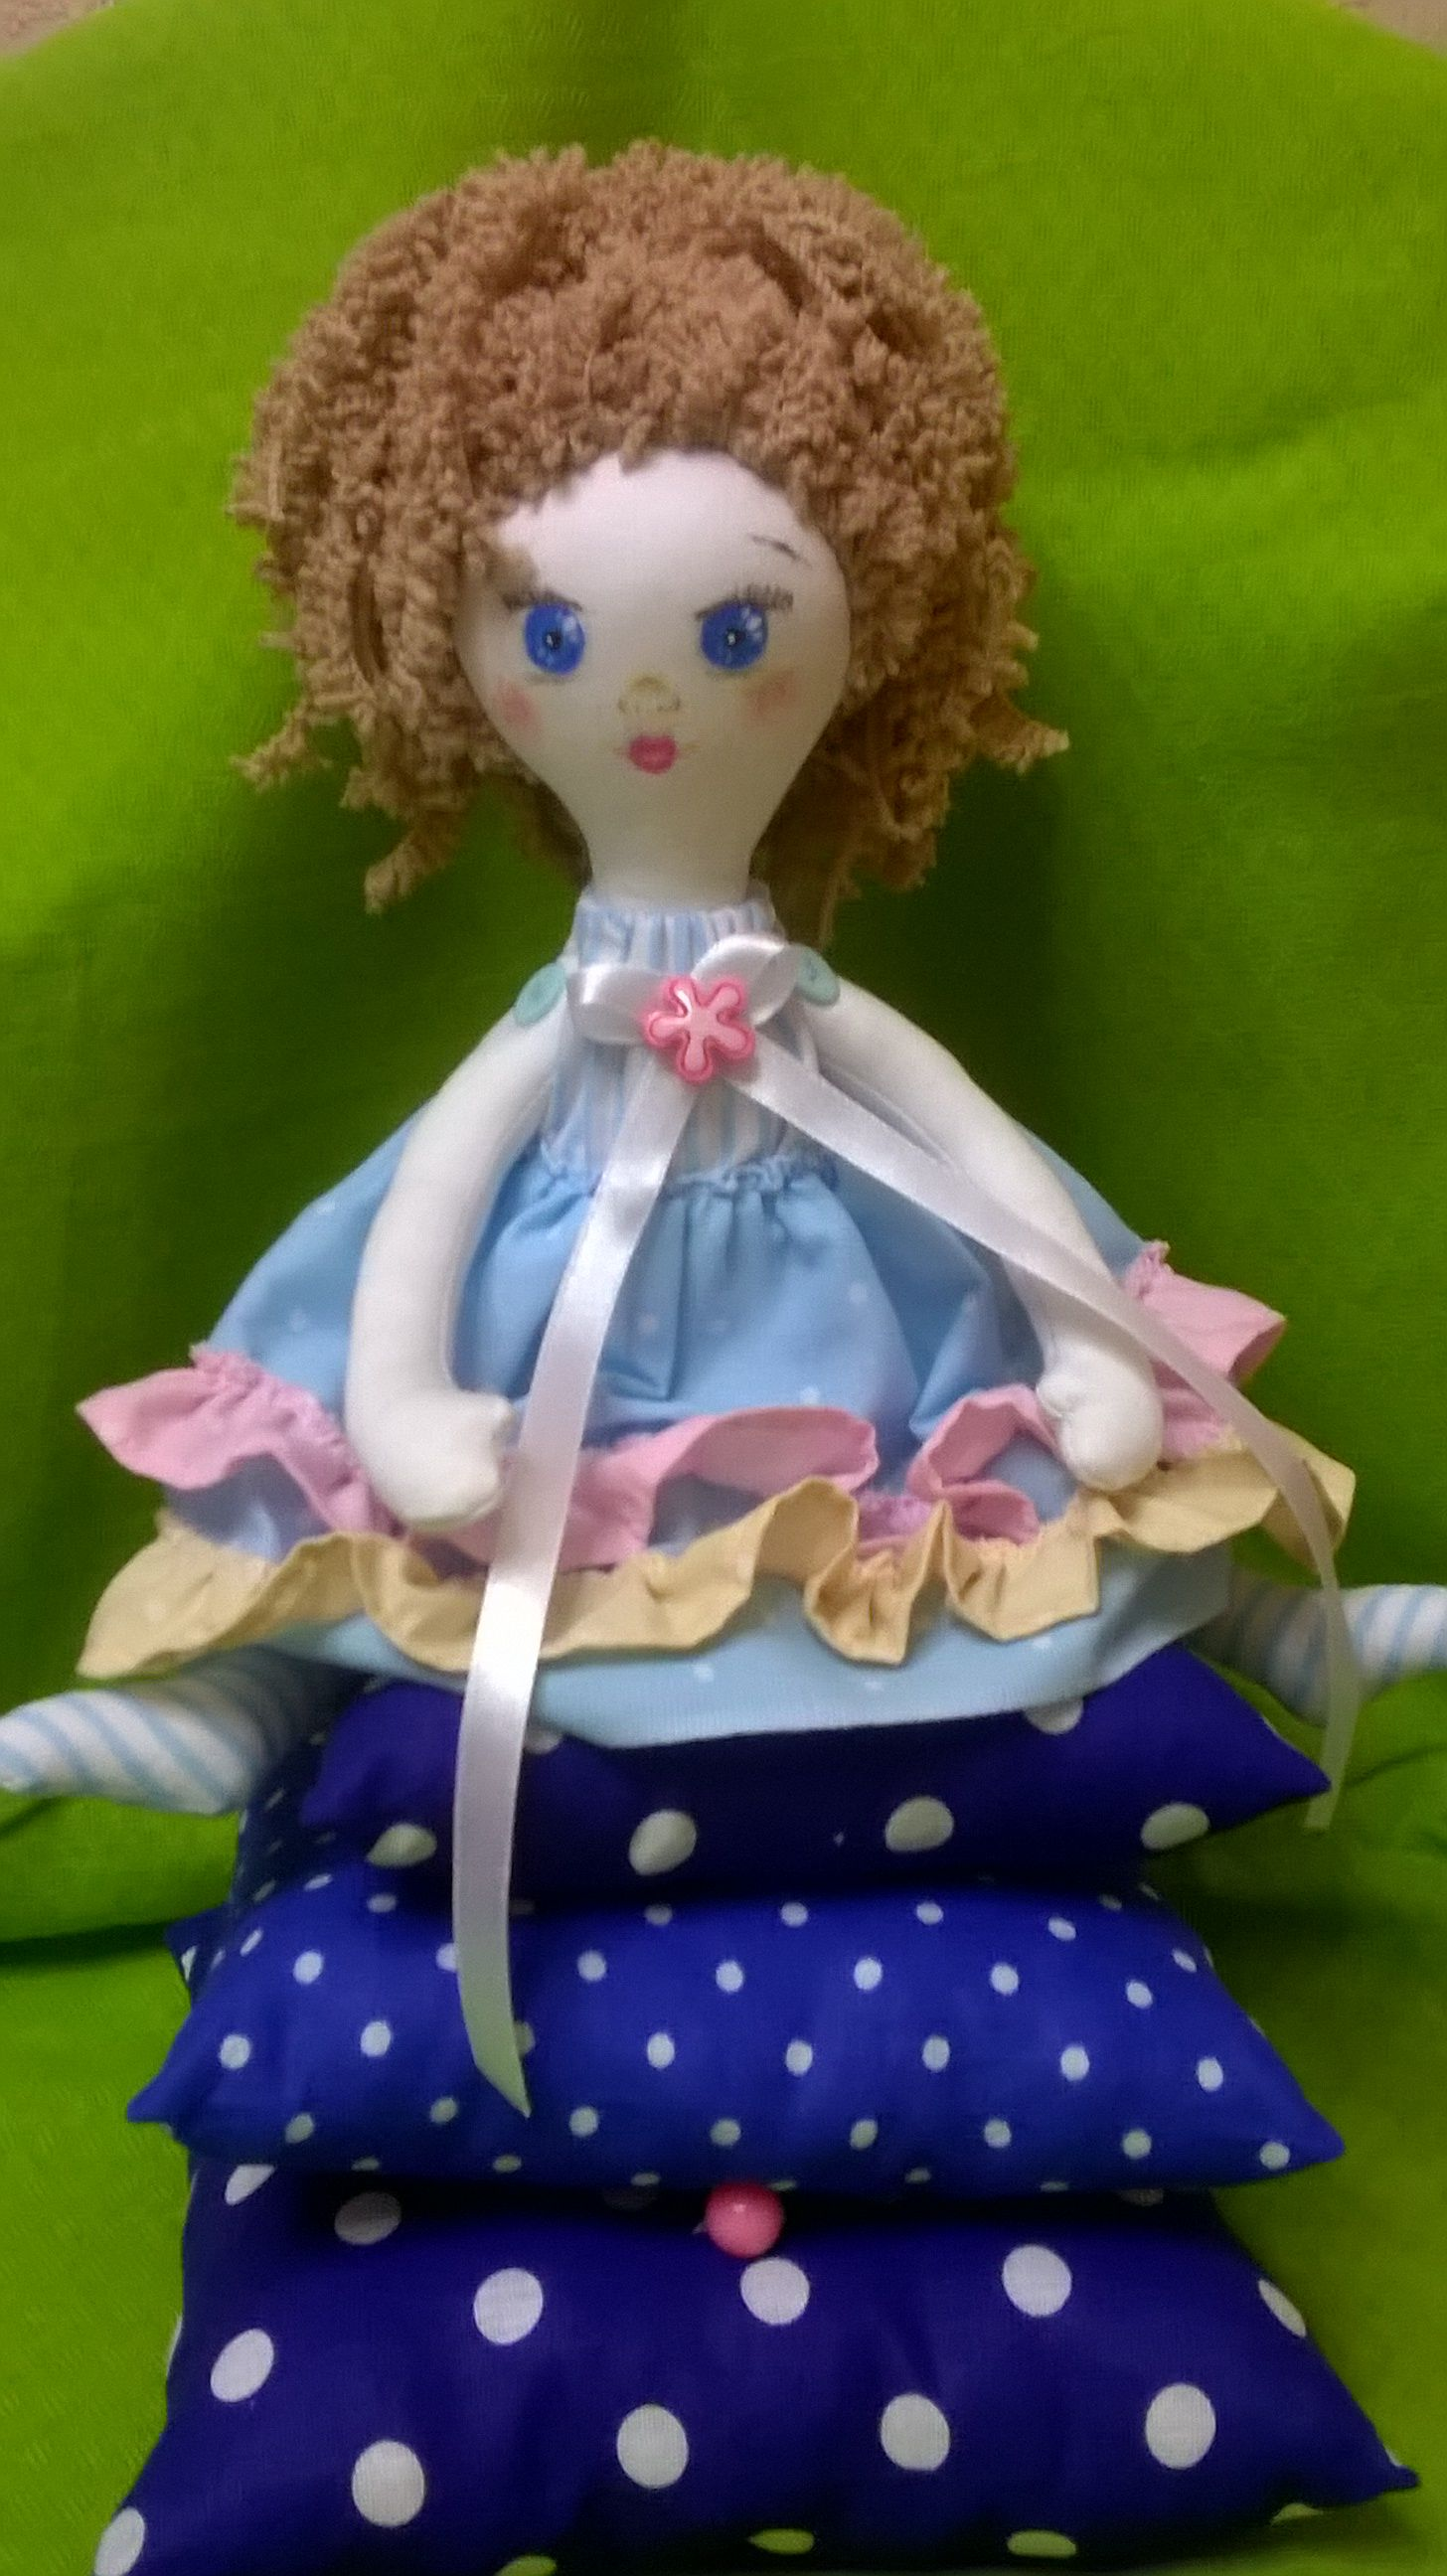 toy textile fairytale princess